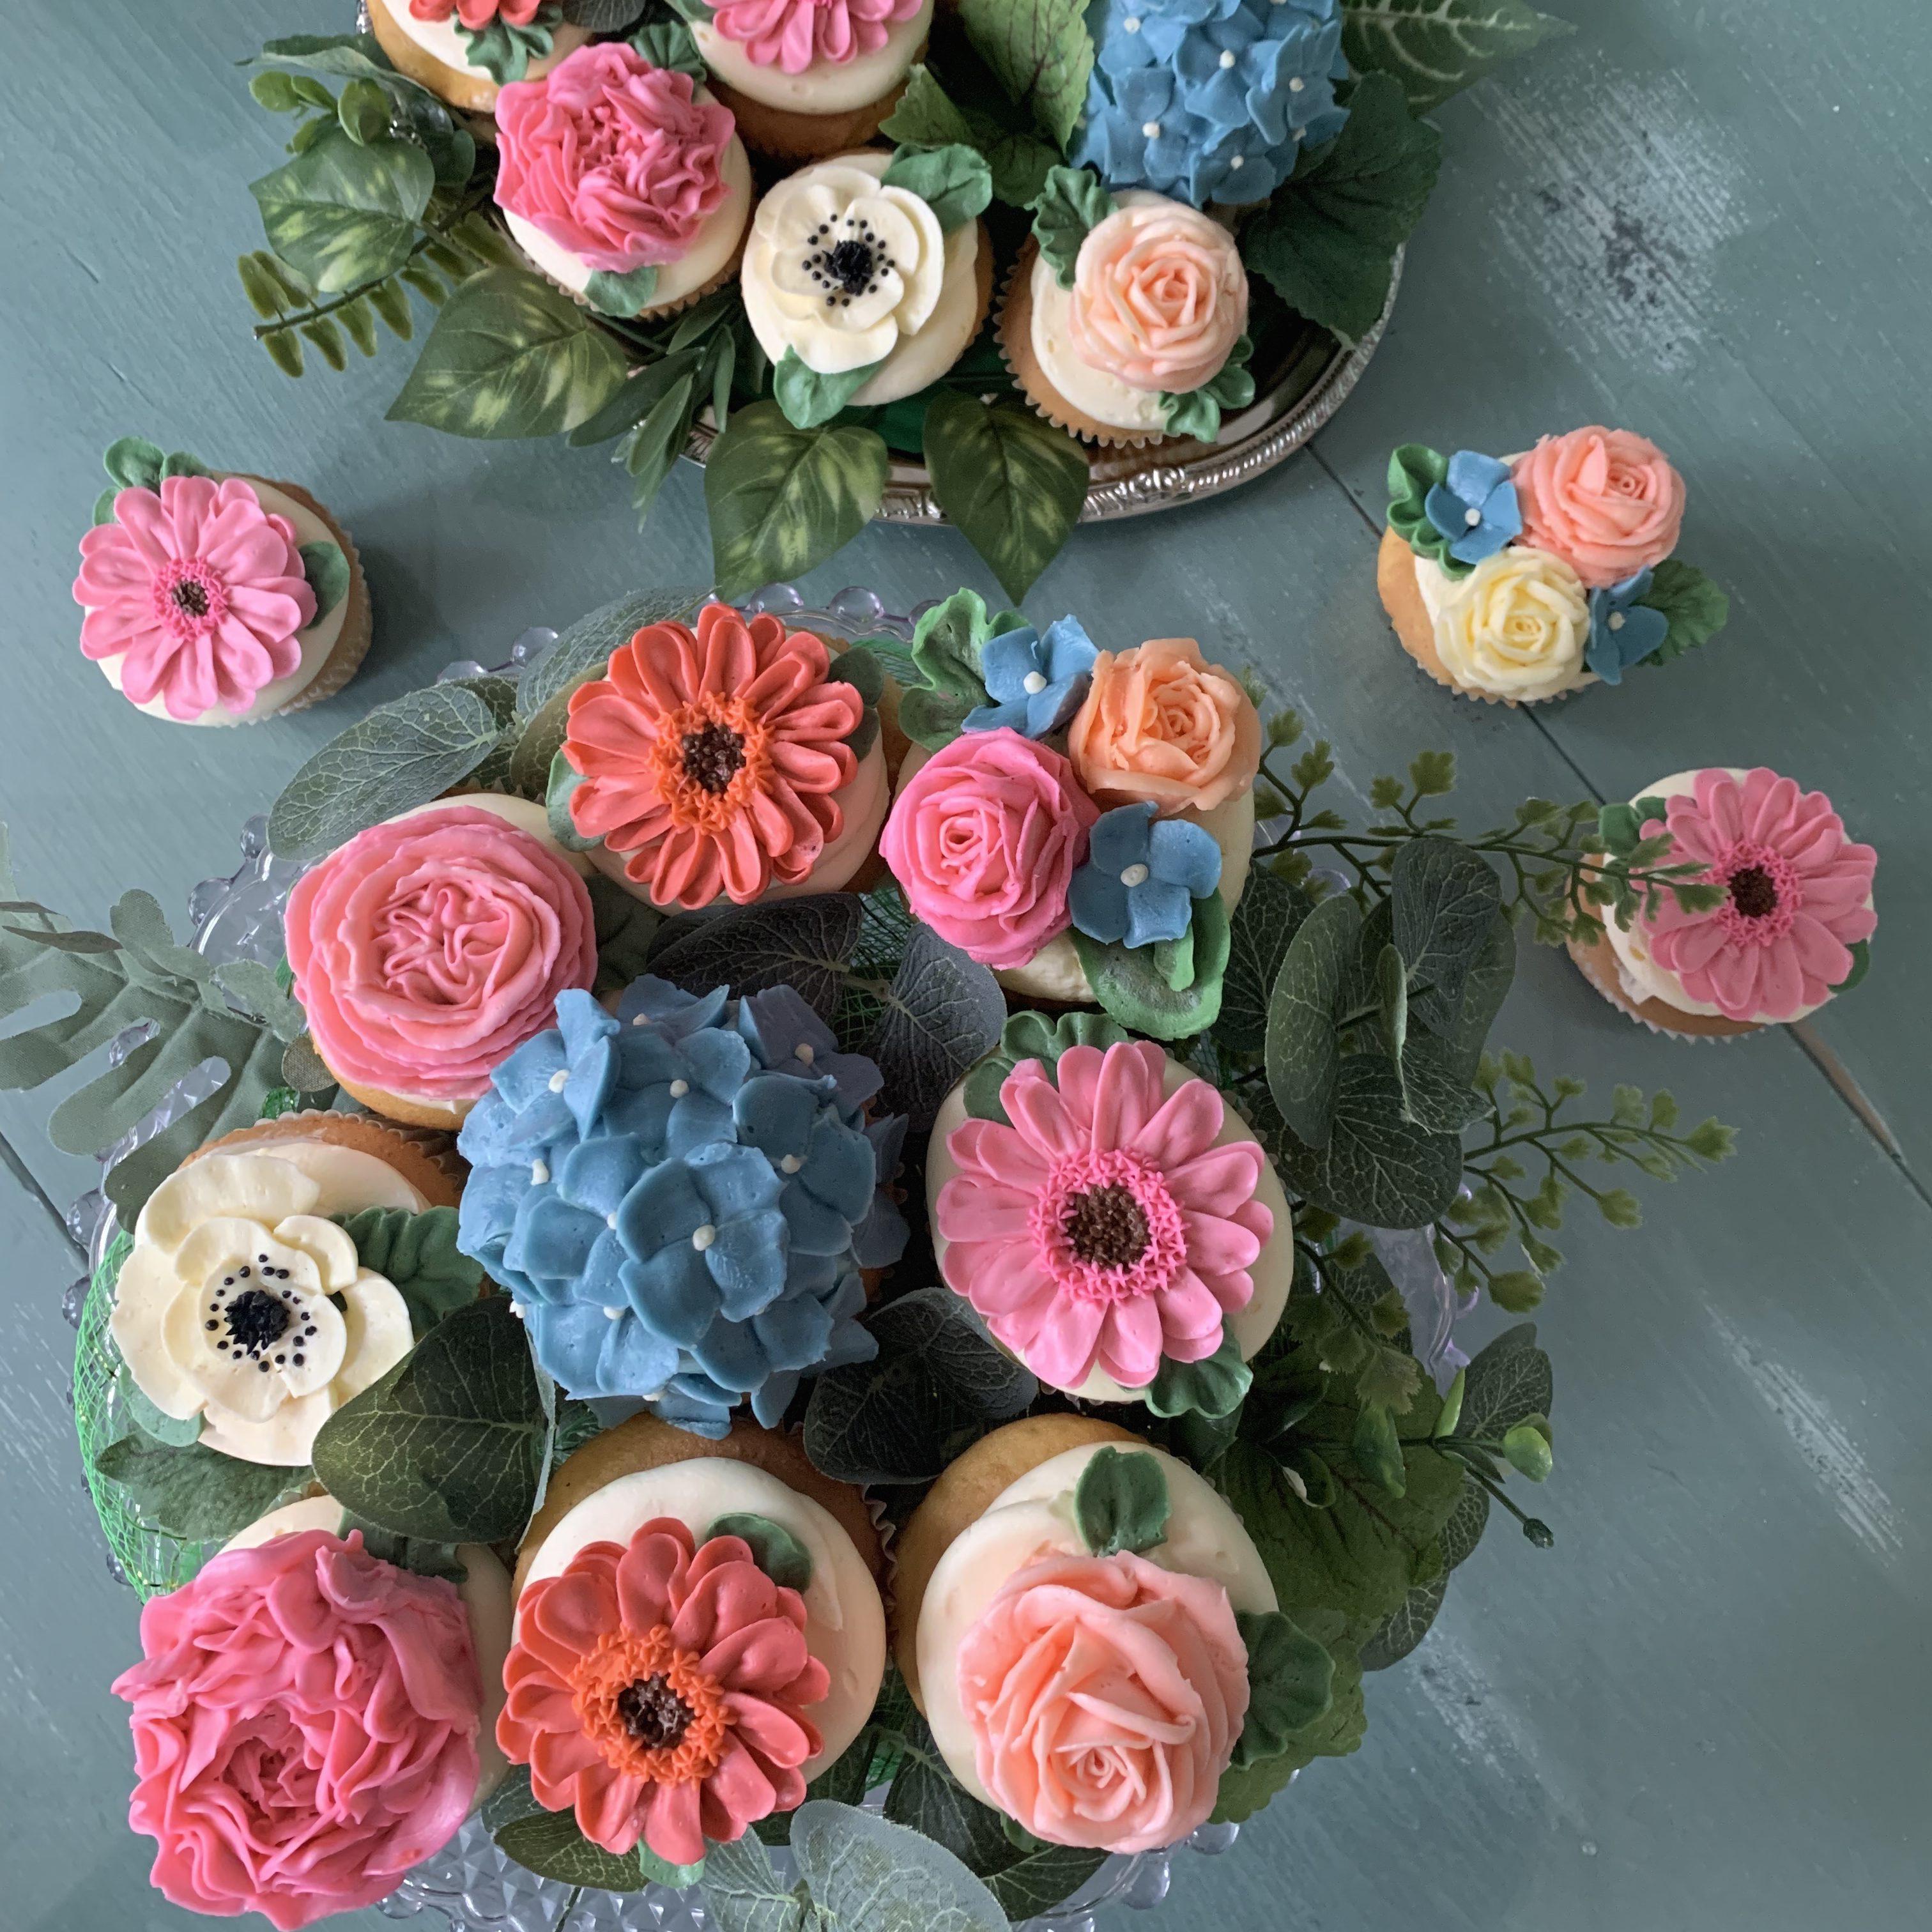 https://delicatelydelicious.com/wp-content/uploads/2019/05/Mutlicolored-Floral-Cupcakes-e1558371092581.jpg